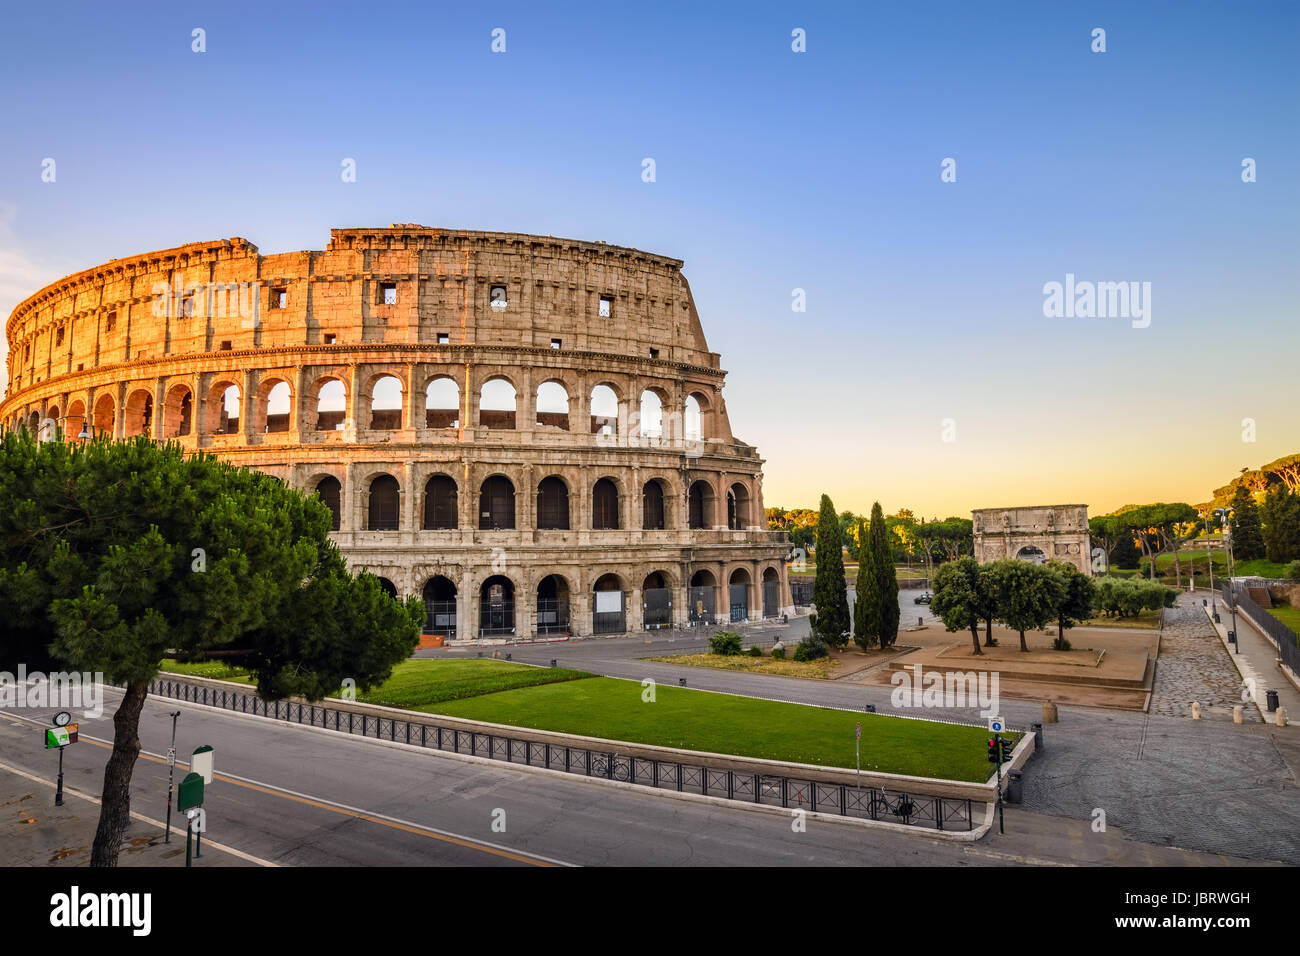 Rome Colosseum (Roma Coliseum), Rome, Italy - Stock Image